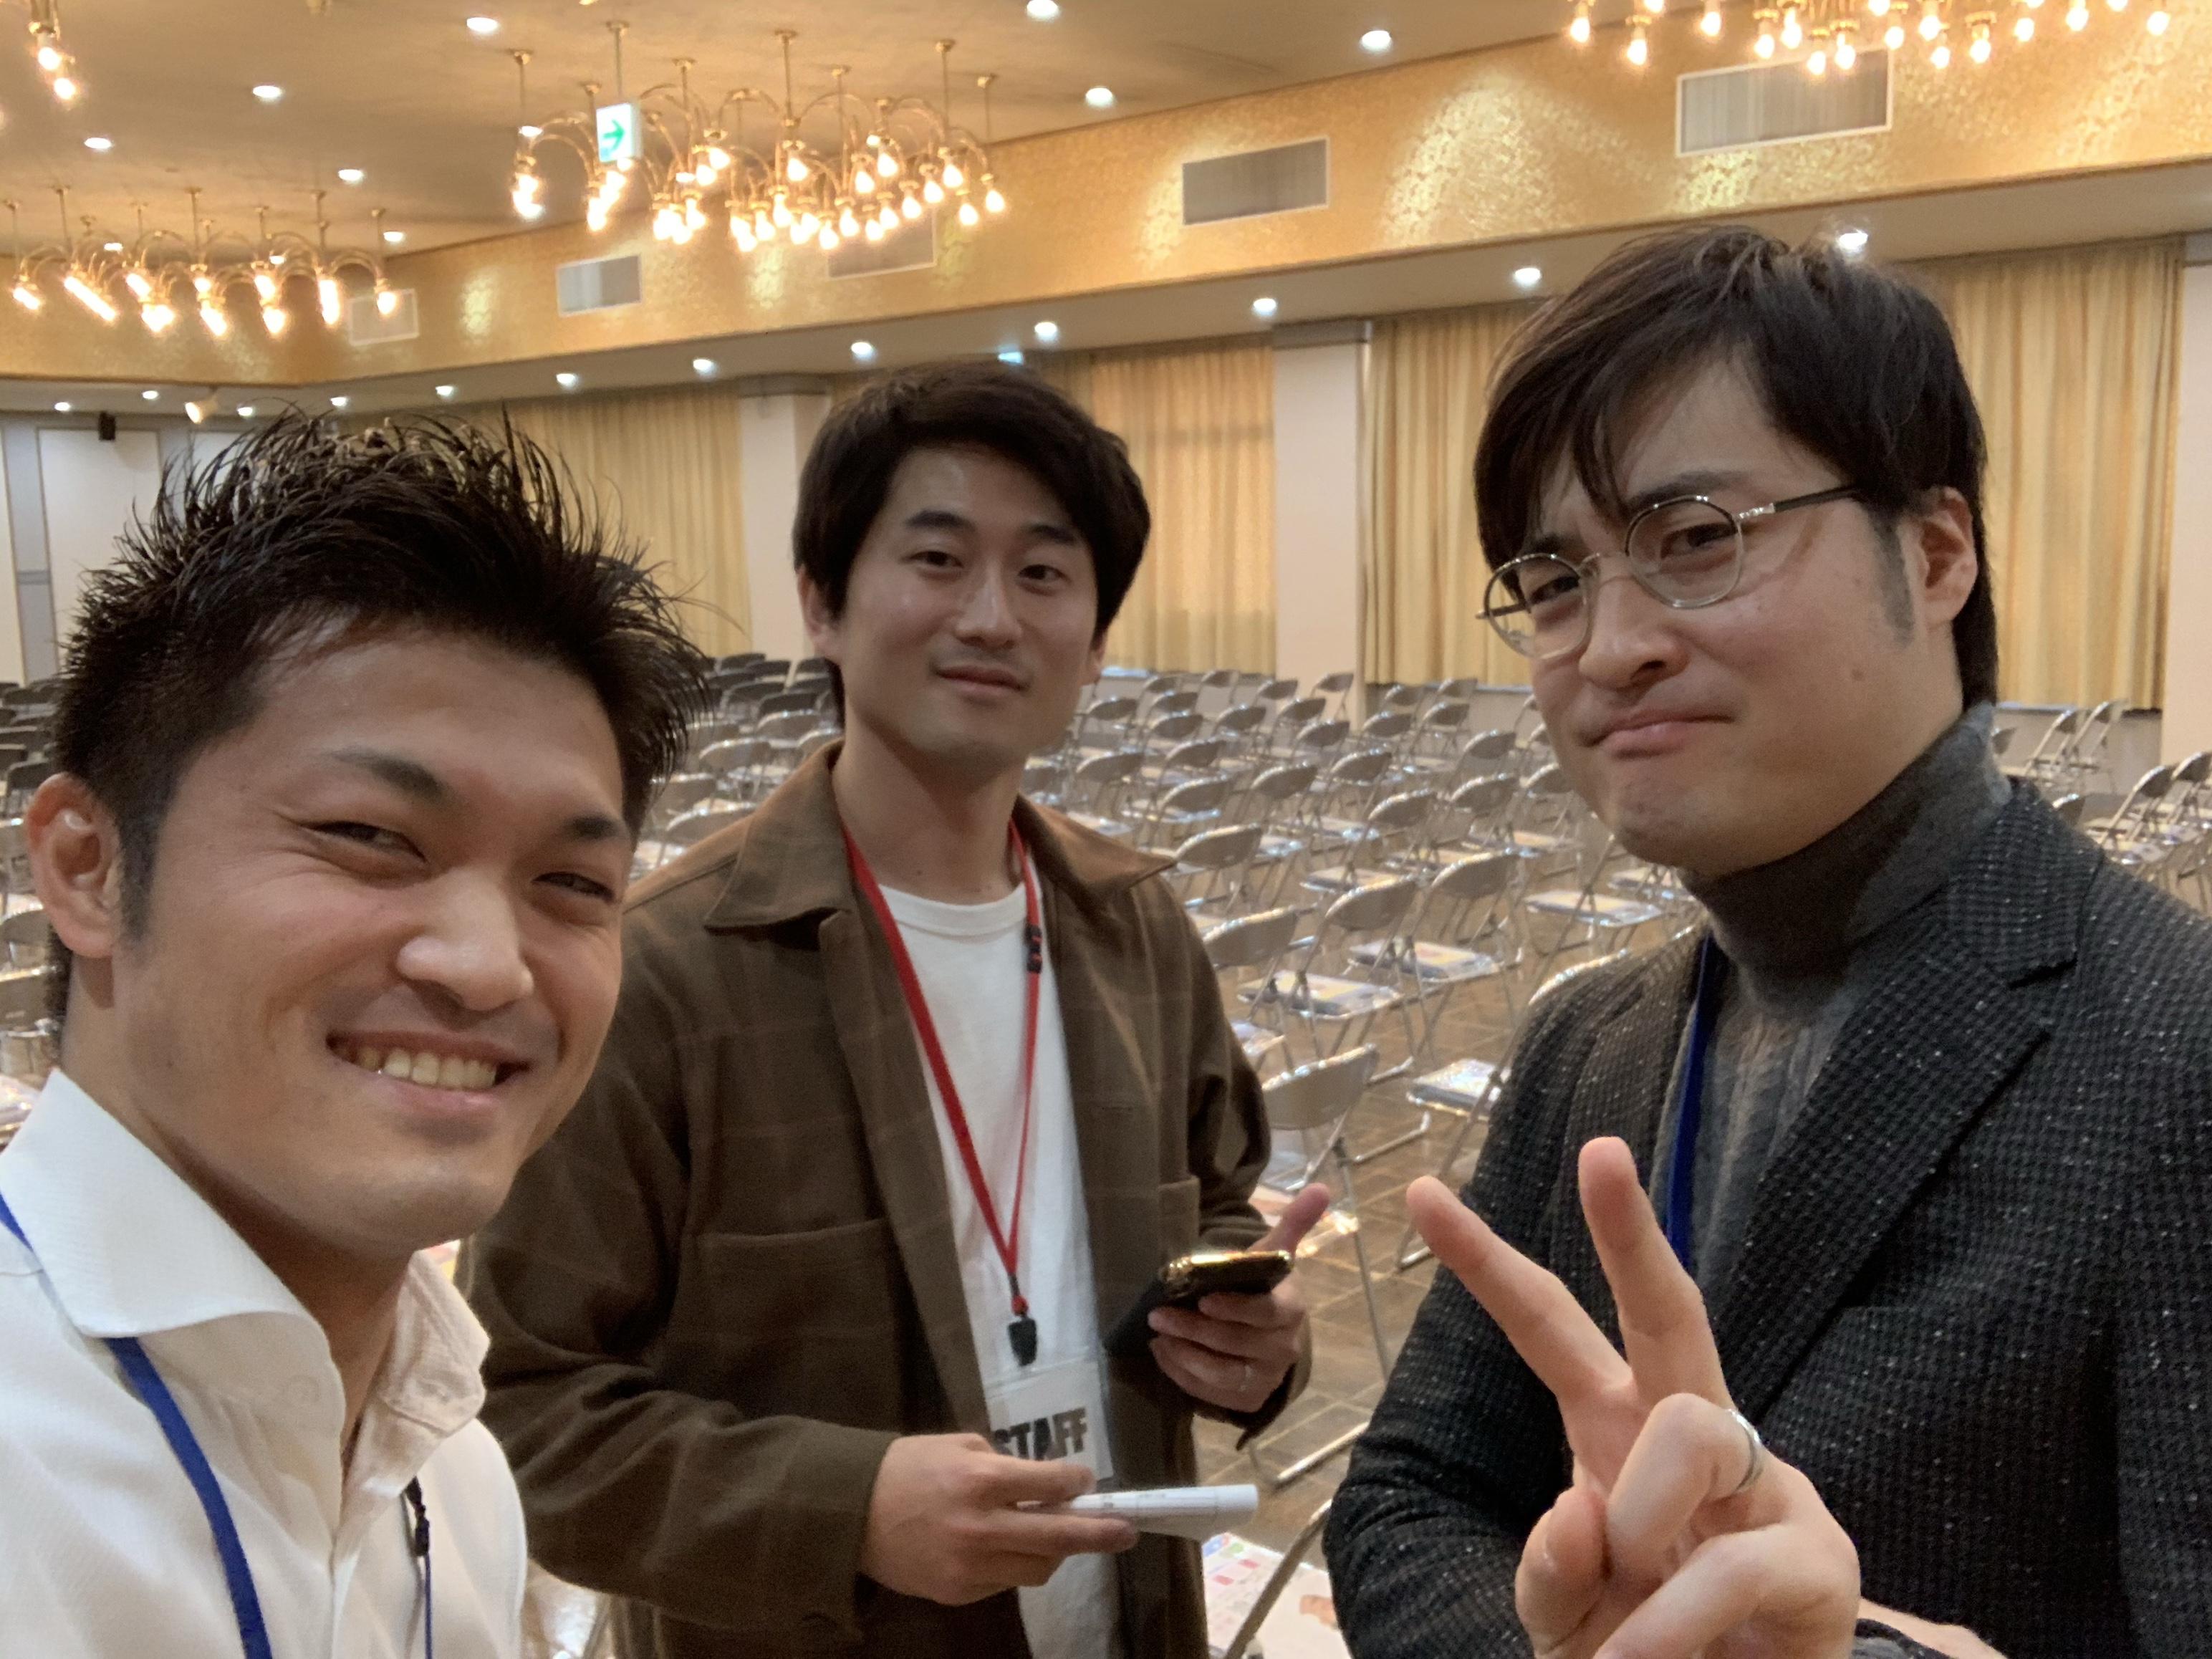 img 4693 - 西野亮廣氏講演会だー!